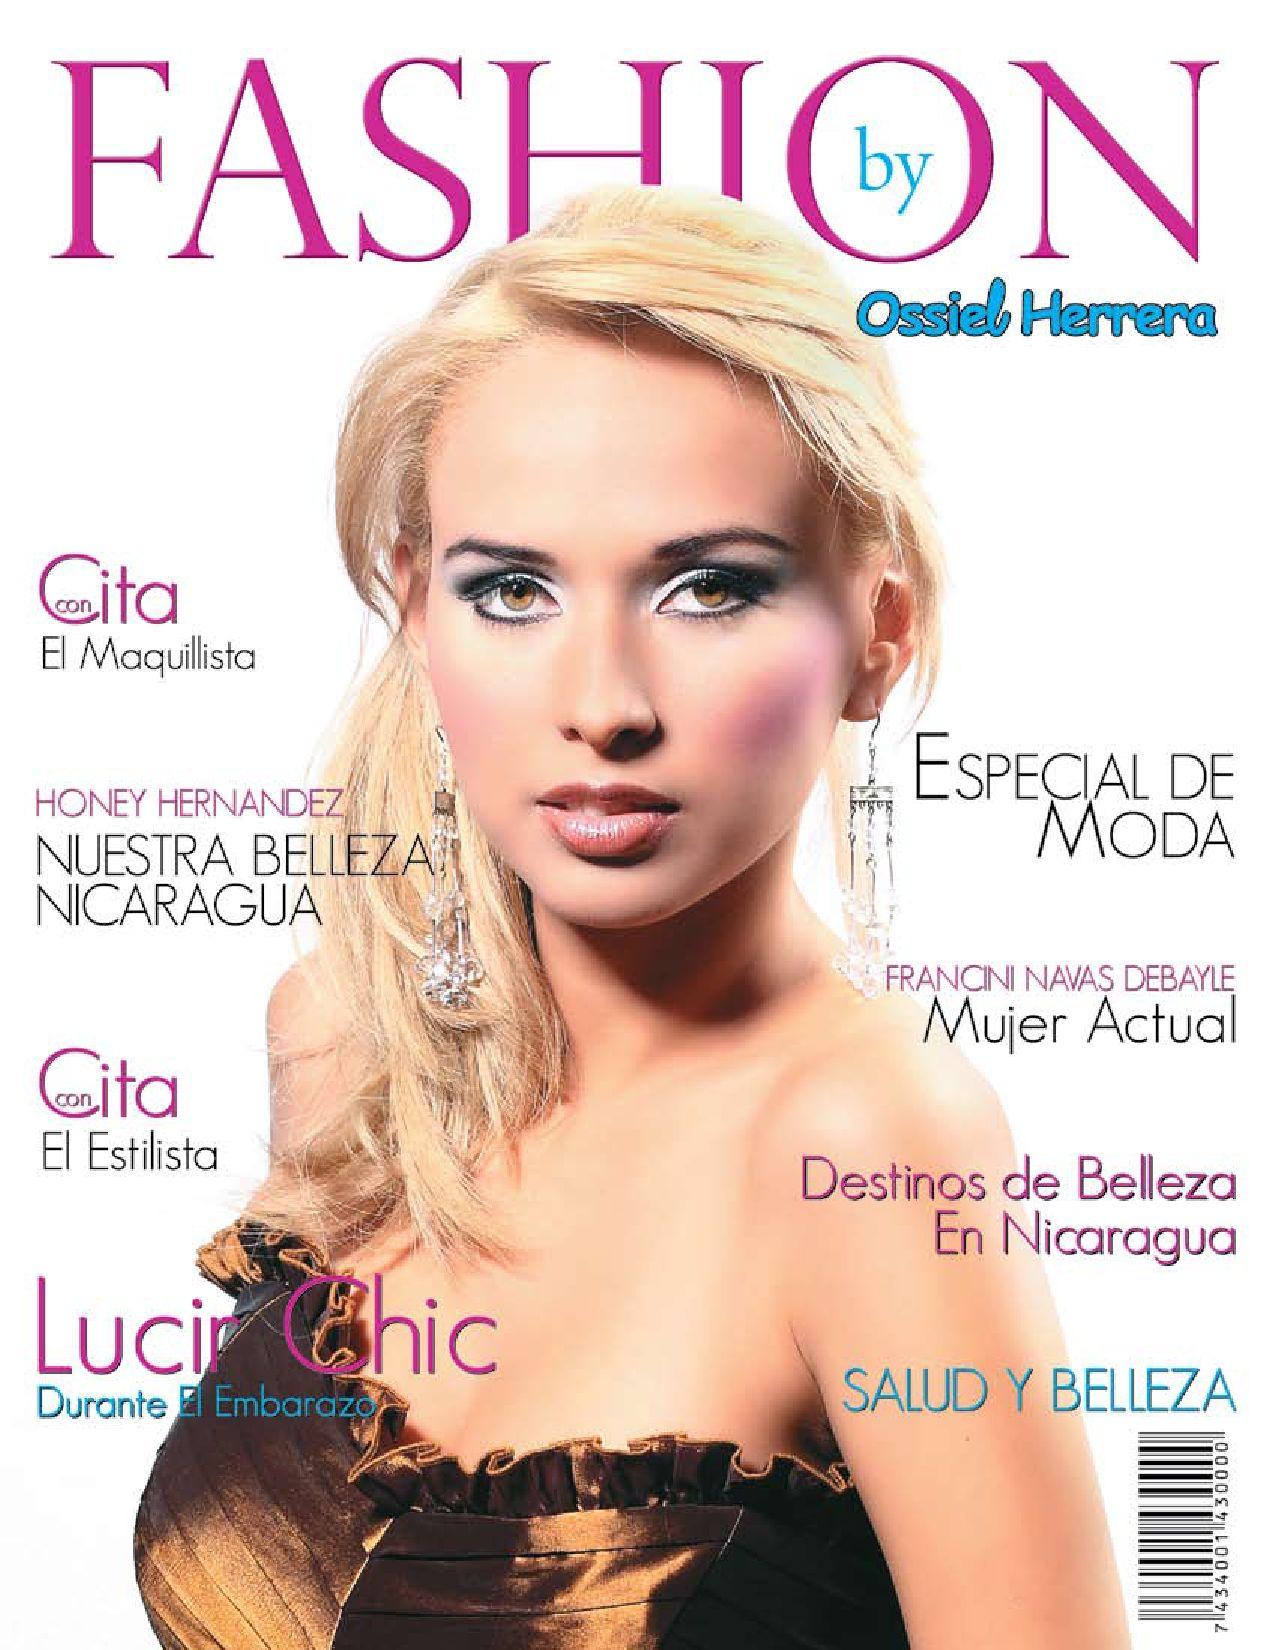 FASHION by Ossiel Herrera by Ossiel Herrera - issuu